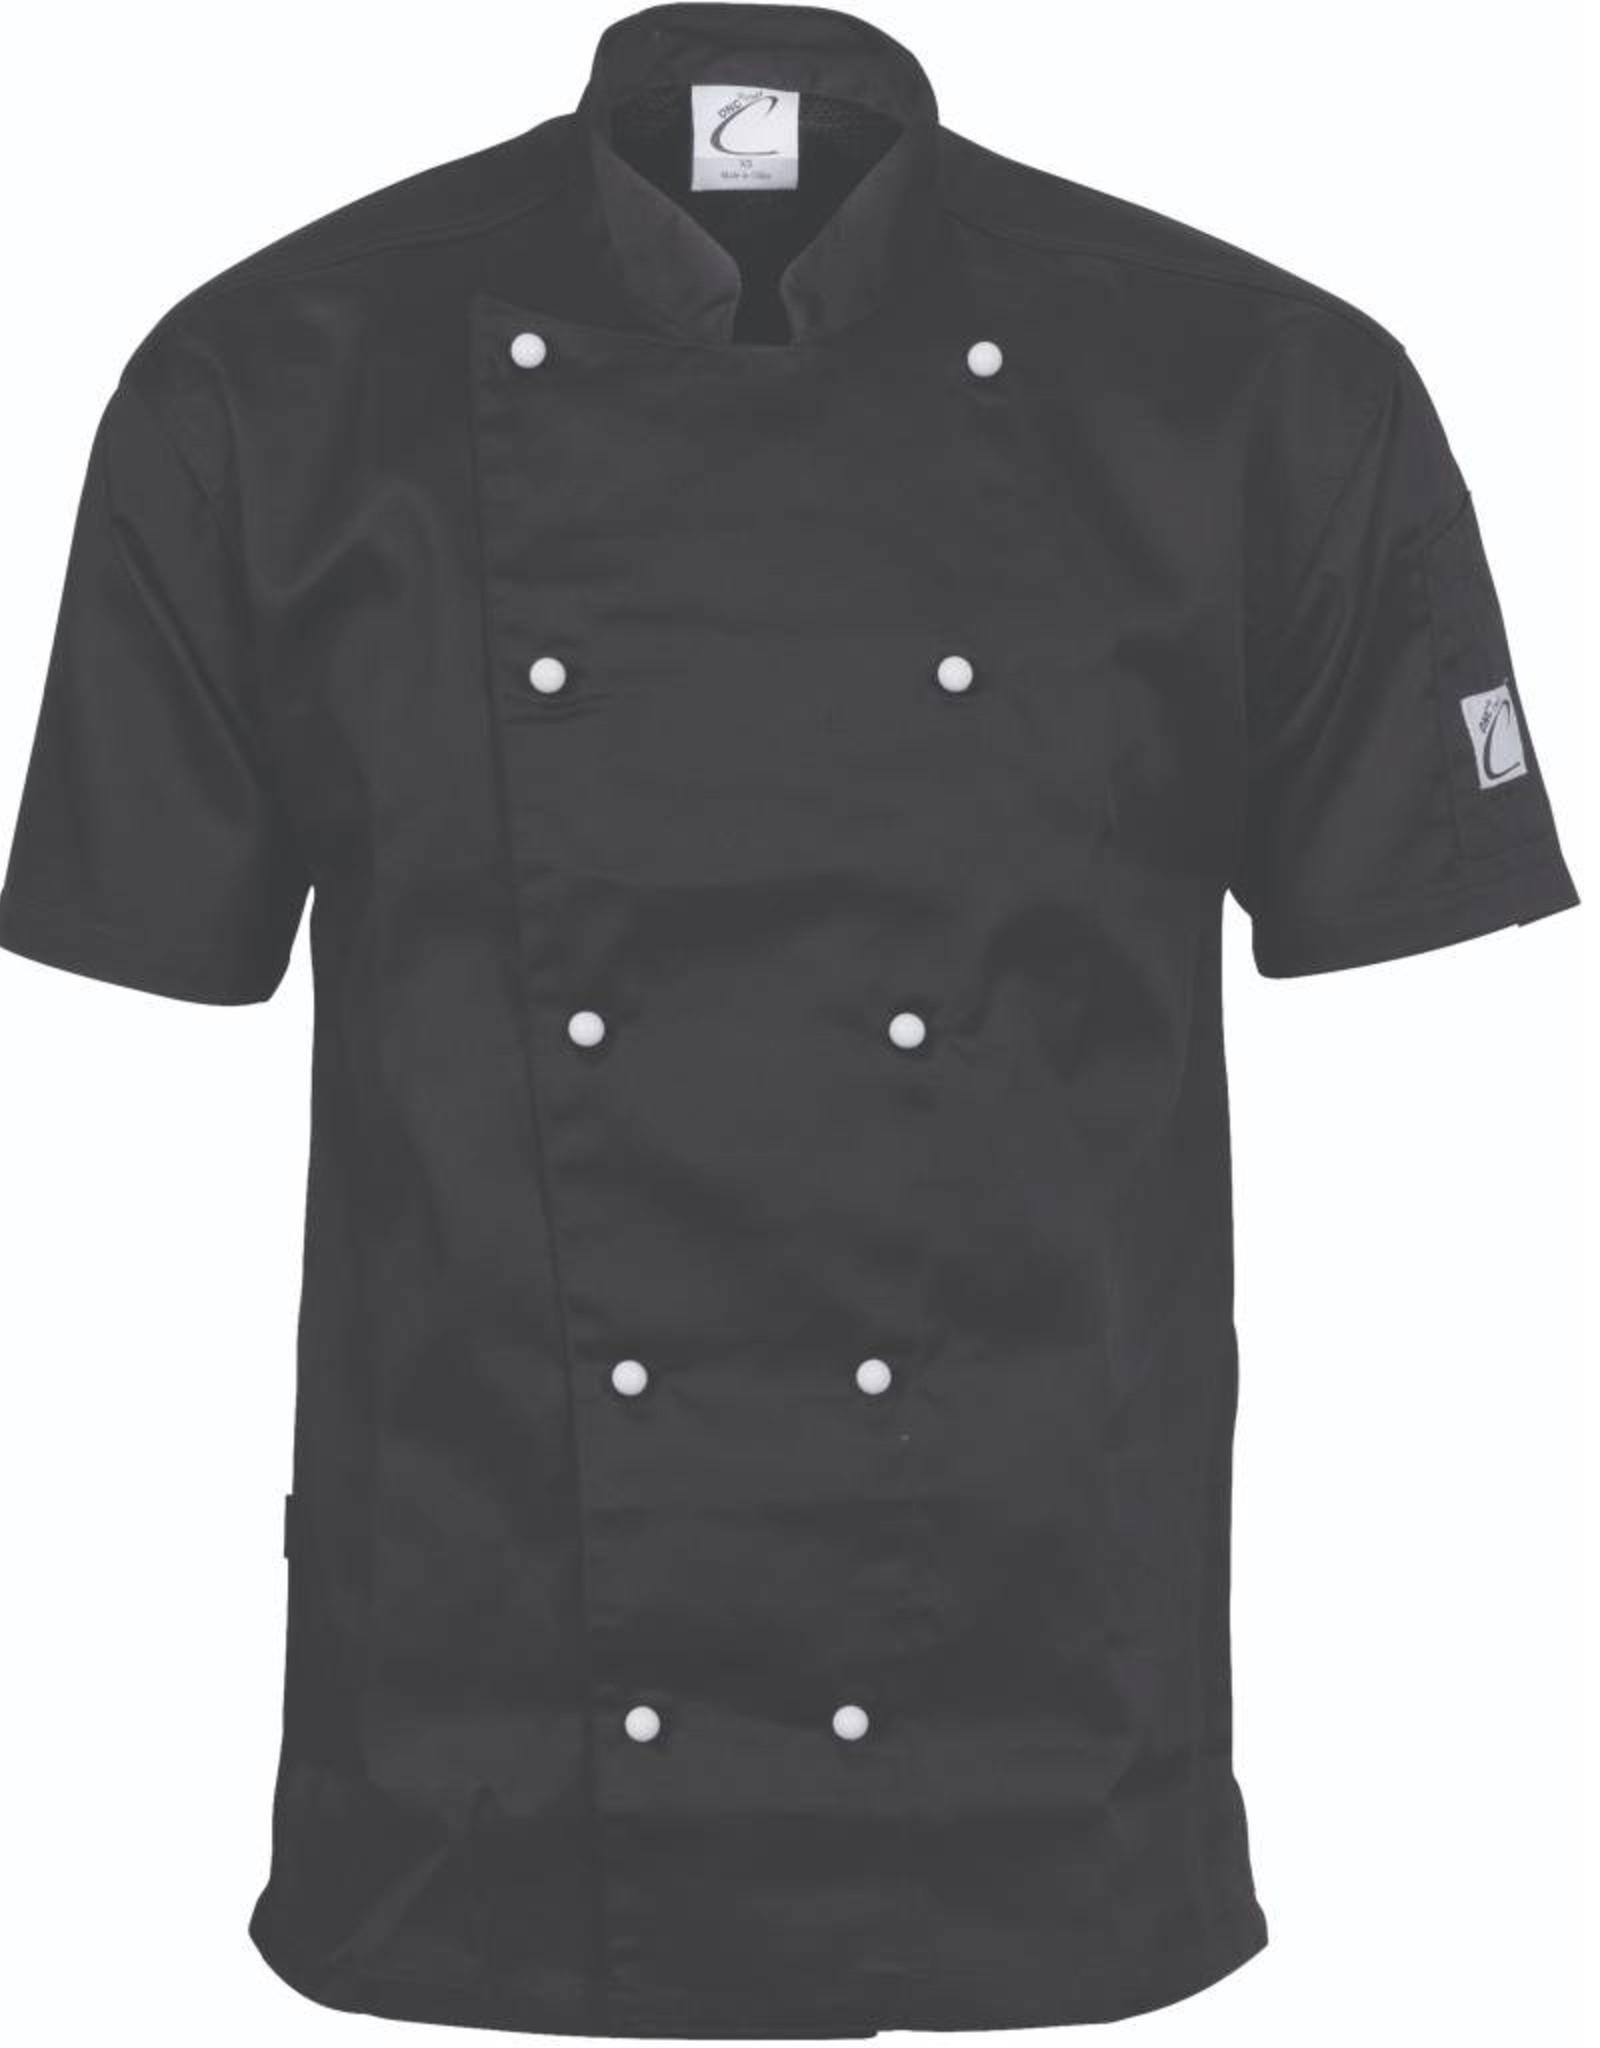 DNC Workwear DNC Traditional Short Sleeve Chefs Jacket